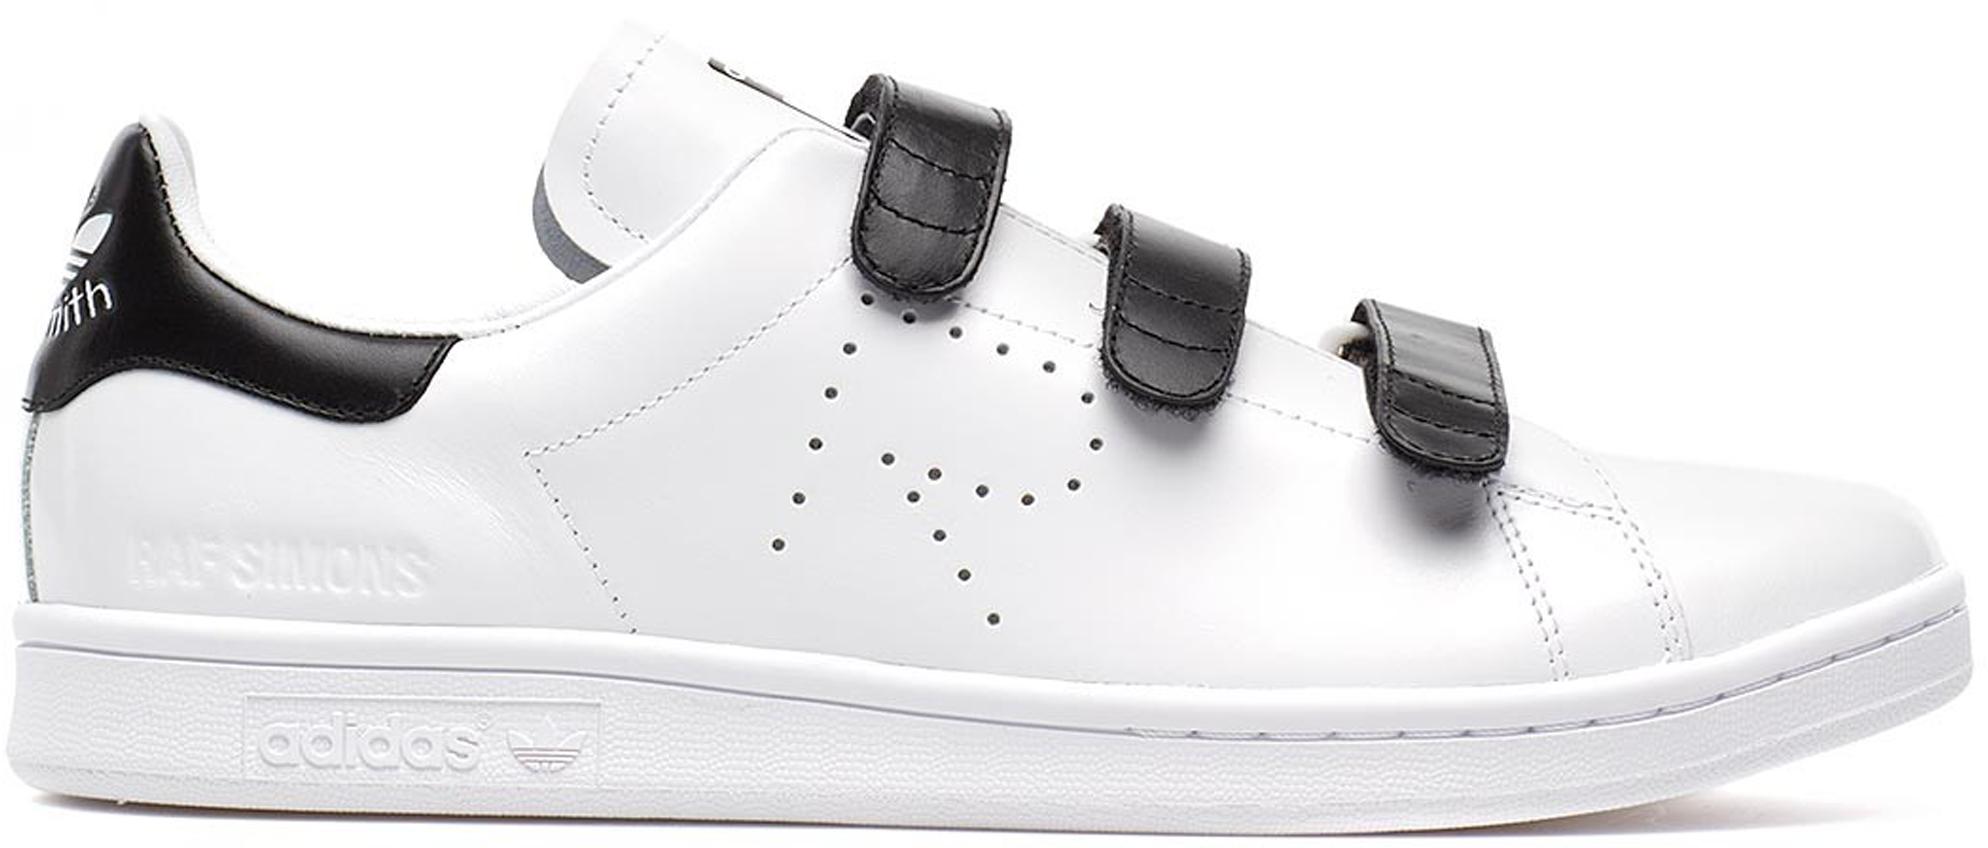 adidas Stan Smith Raf Simons Comfort White Black